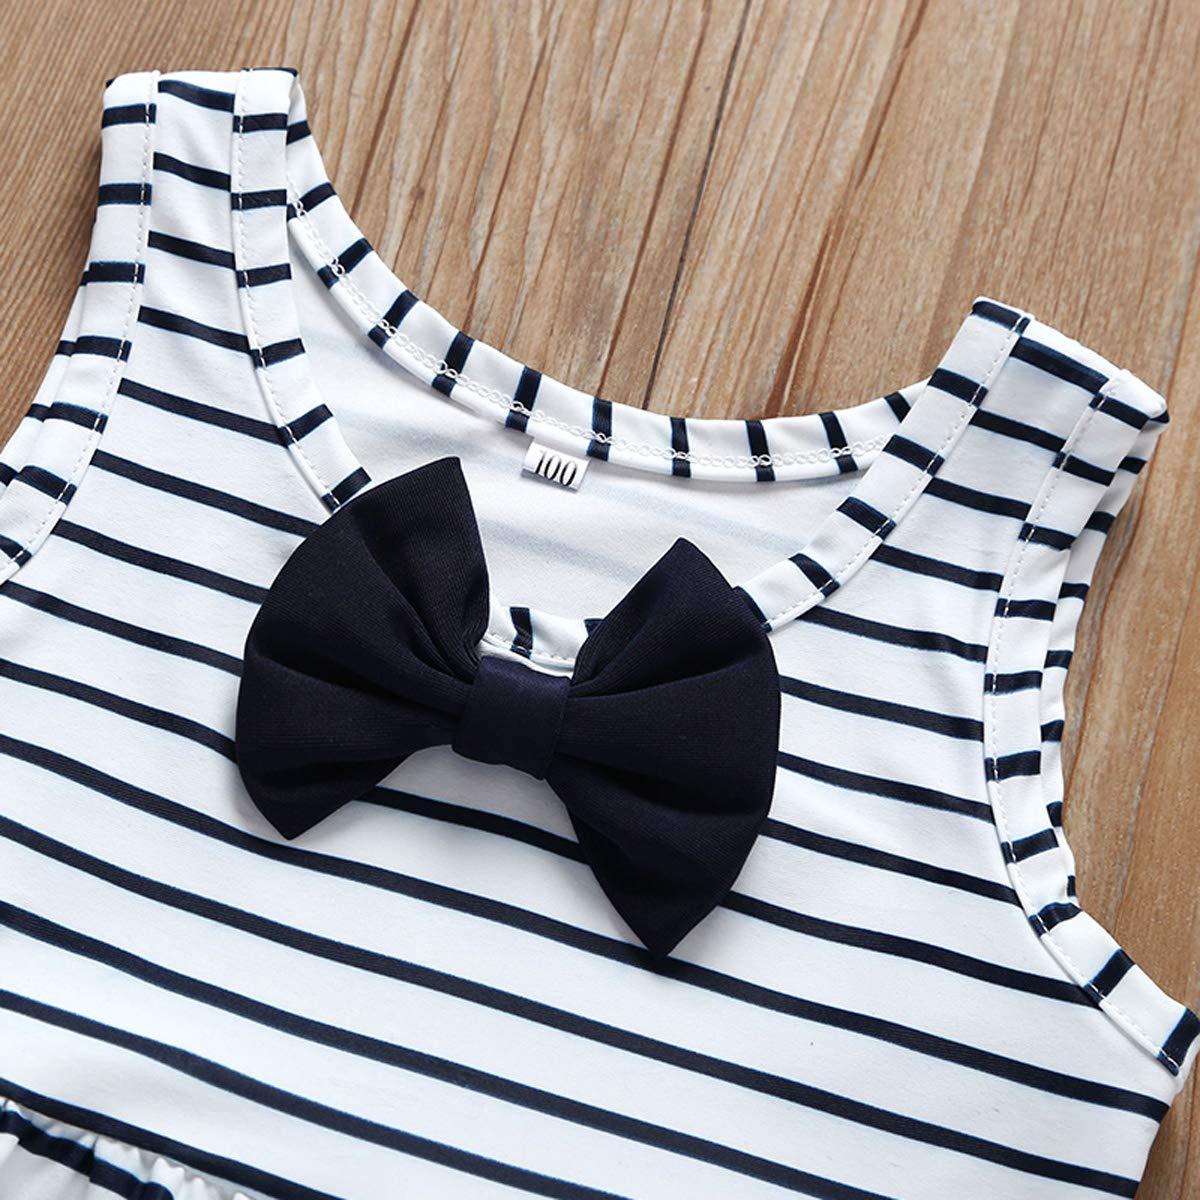 Baby Girl Bikini Striped Beach Swimsuit Ruffles Bathing Suit Adjustable Swimwear 2 Pcs Set